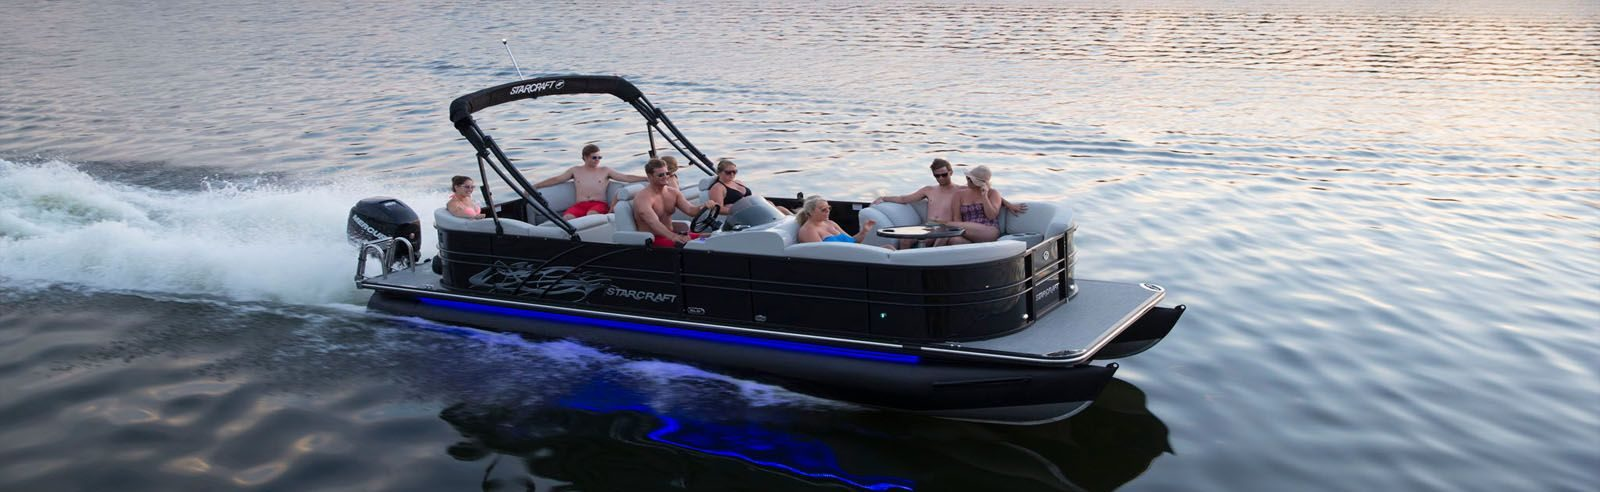 Starcraft SLS pontoon rental cruising